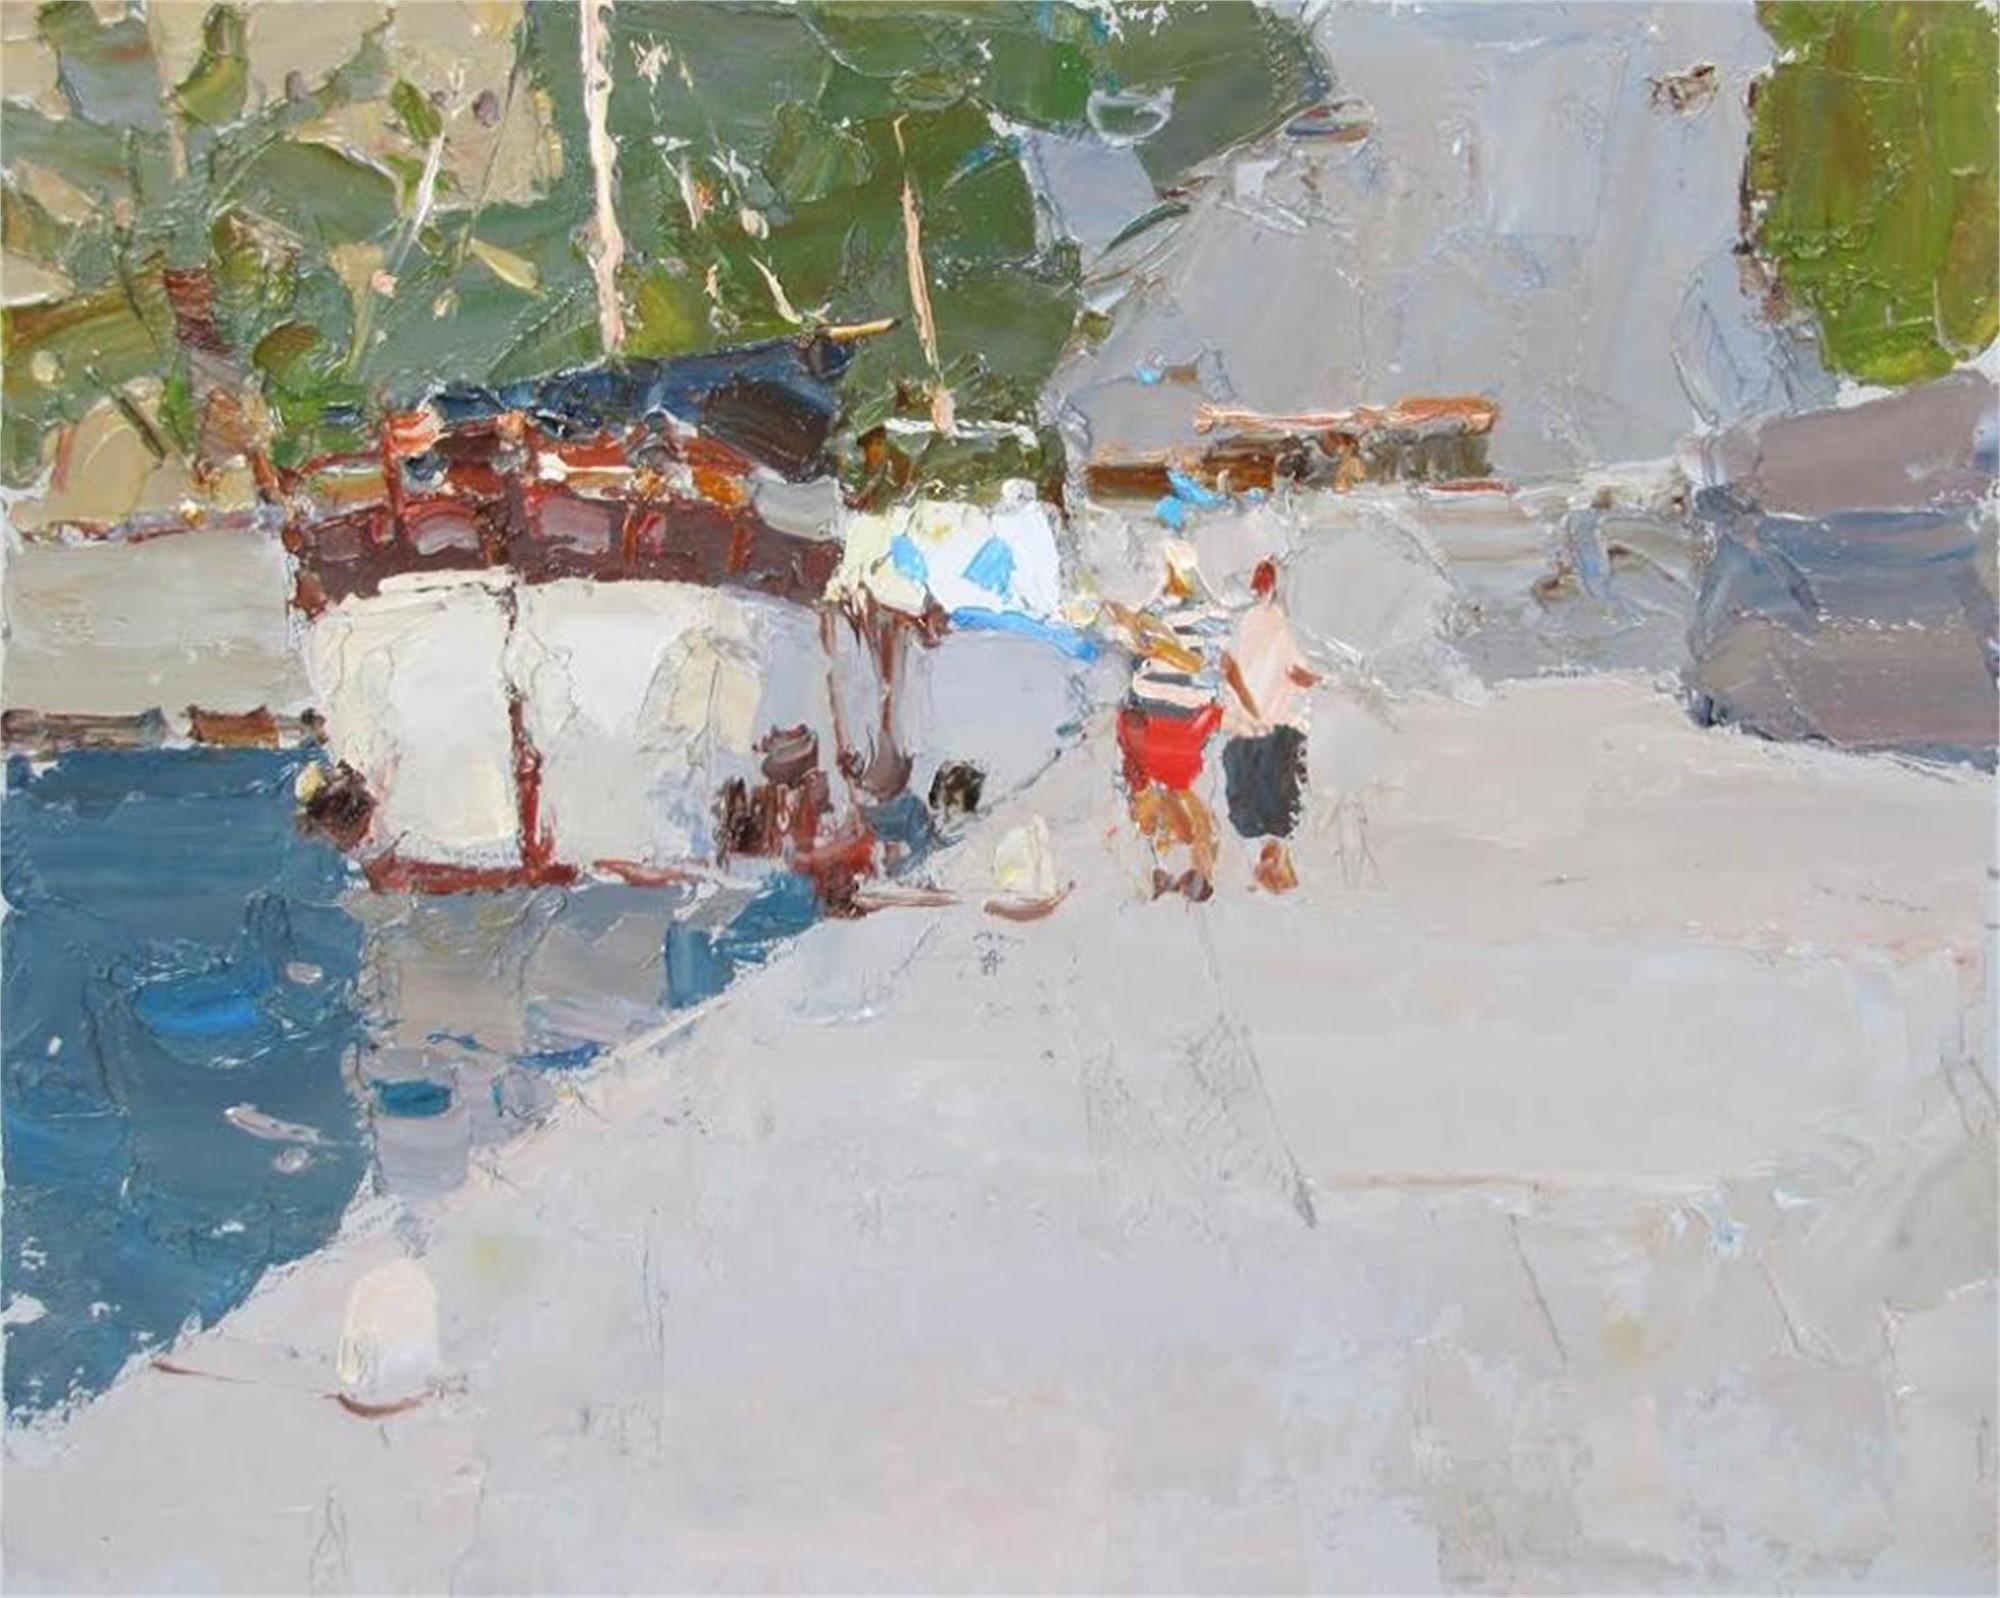 On the Pier by Daniil Volkov